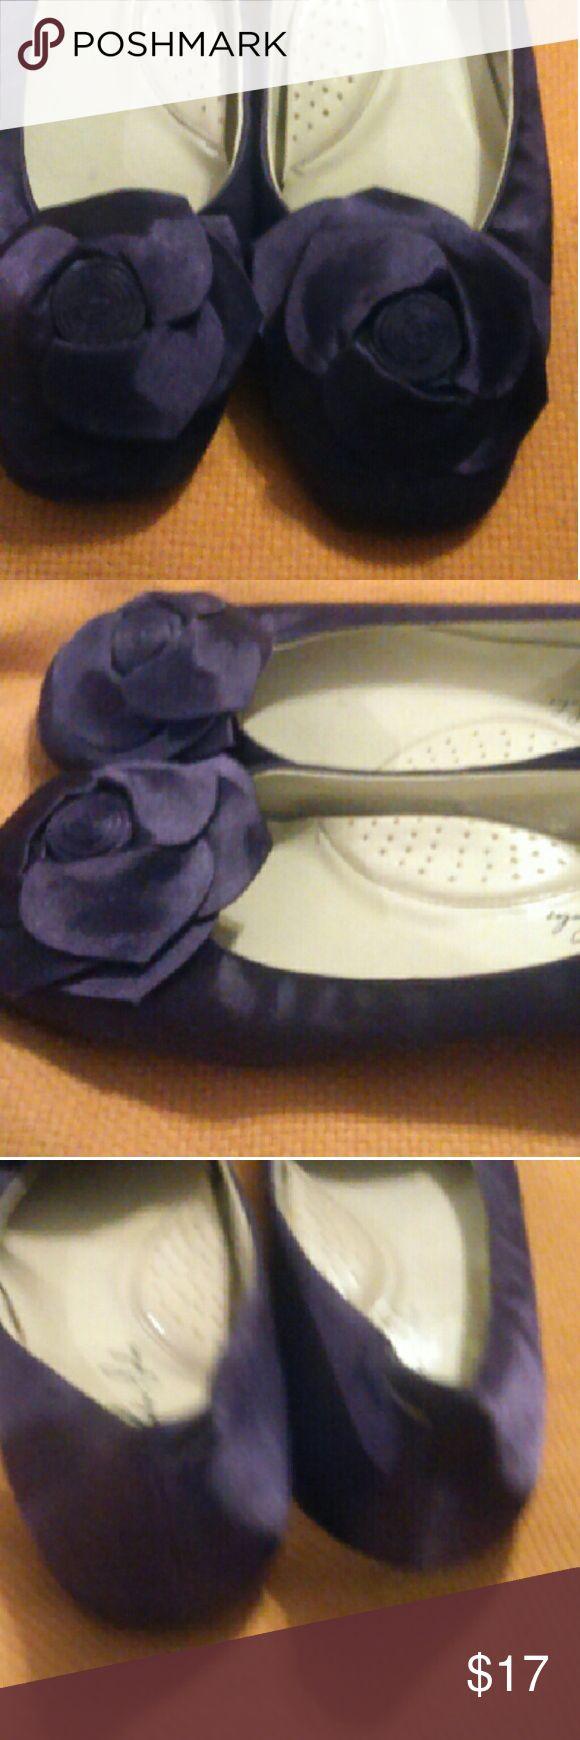 Flats Floral Ballet Flats Romantic Soles Shoes Flats & Loafers